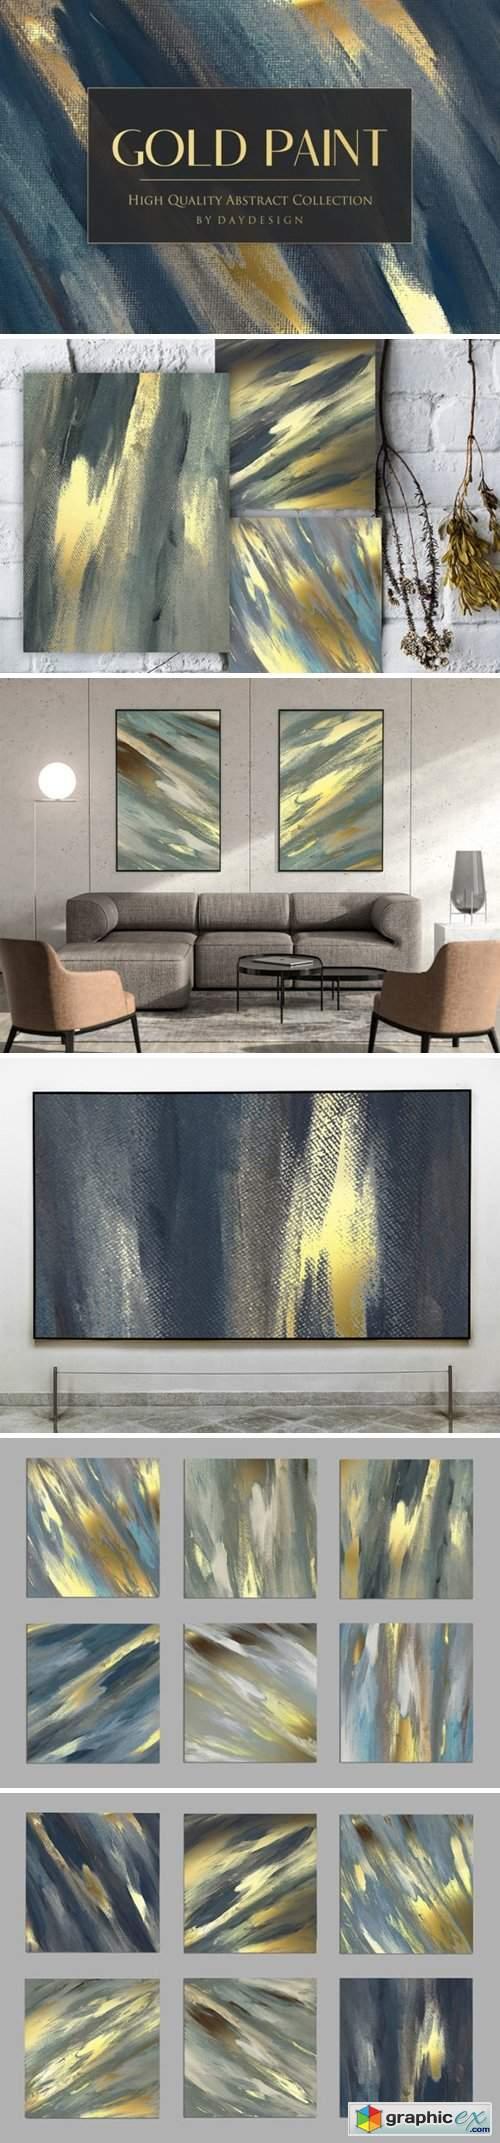 Gold Paint Backgrounds